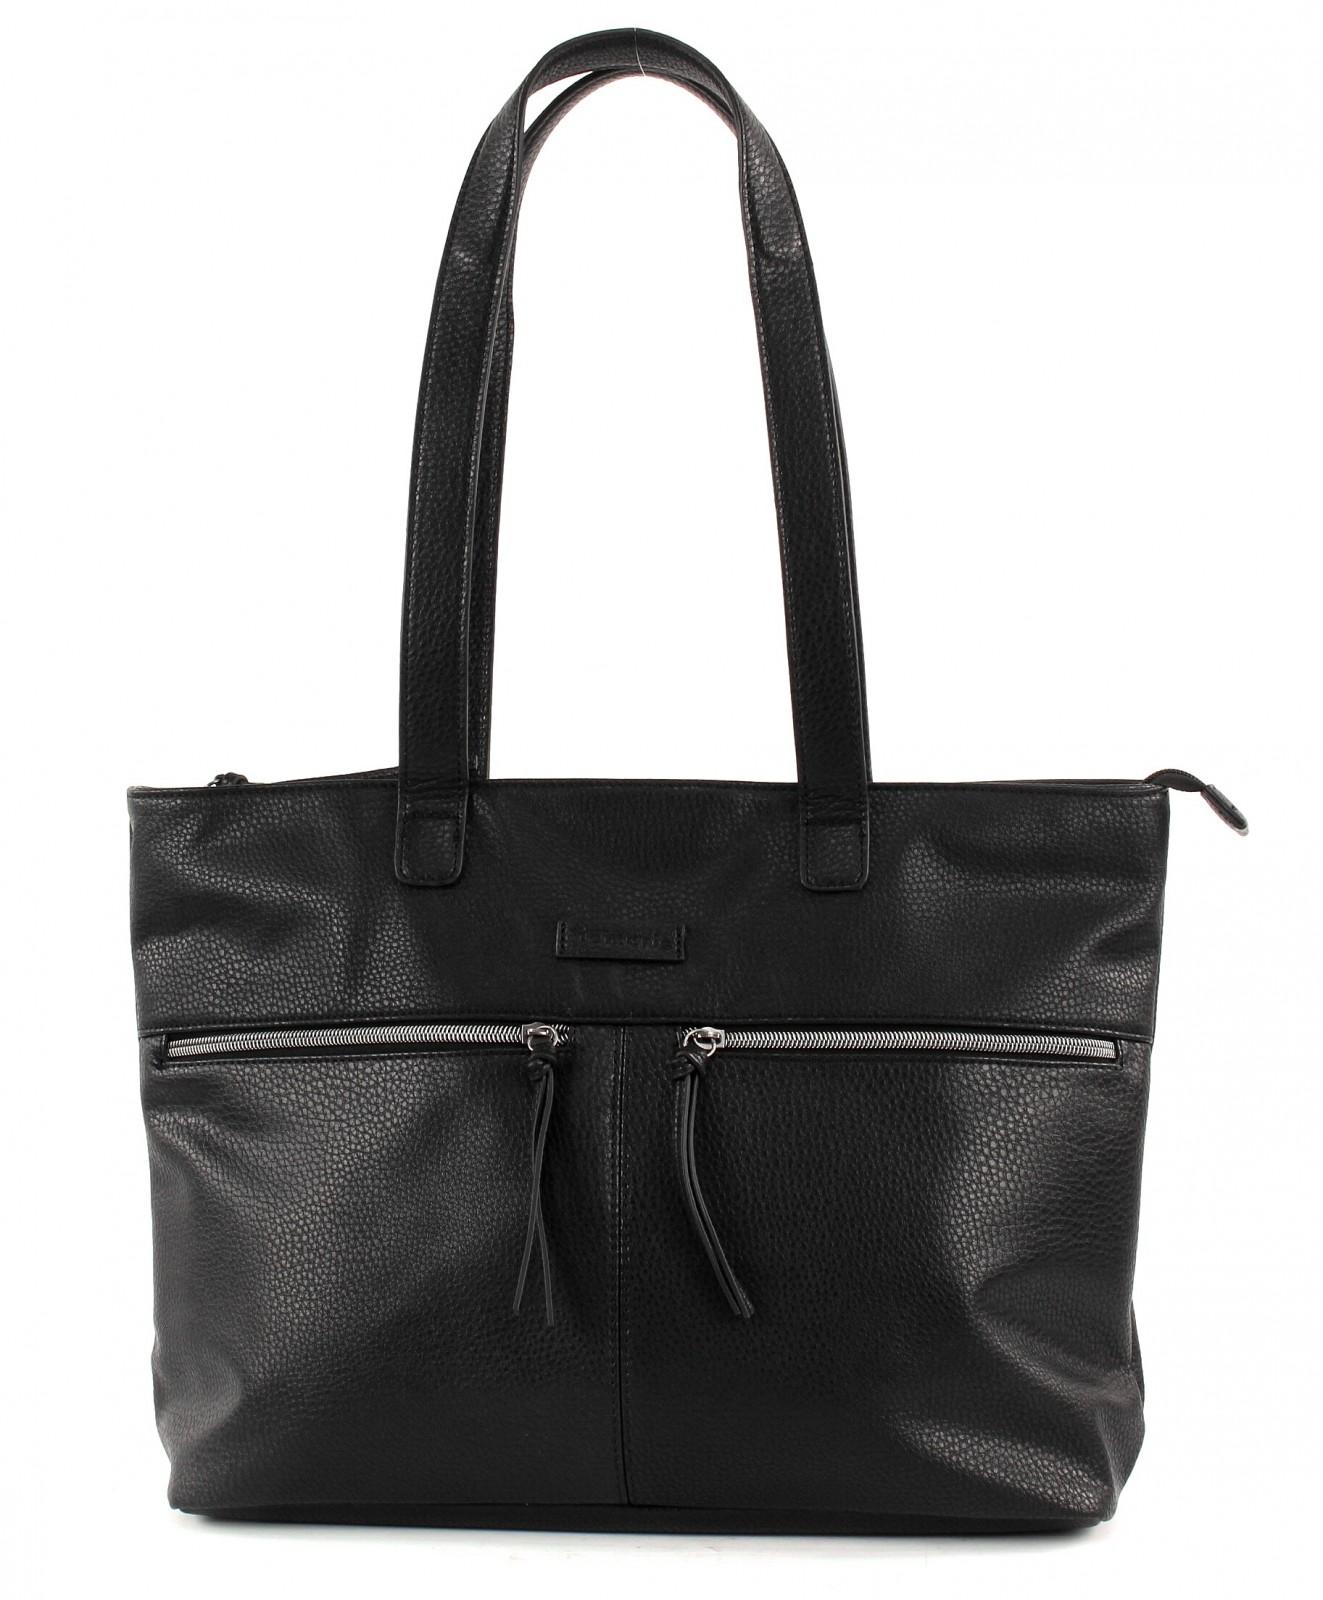 Details zu Tamaris GLAM Business Shopping Bag Tasche Schultertasche Damen Schwarz Neu